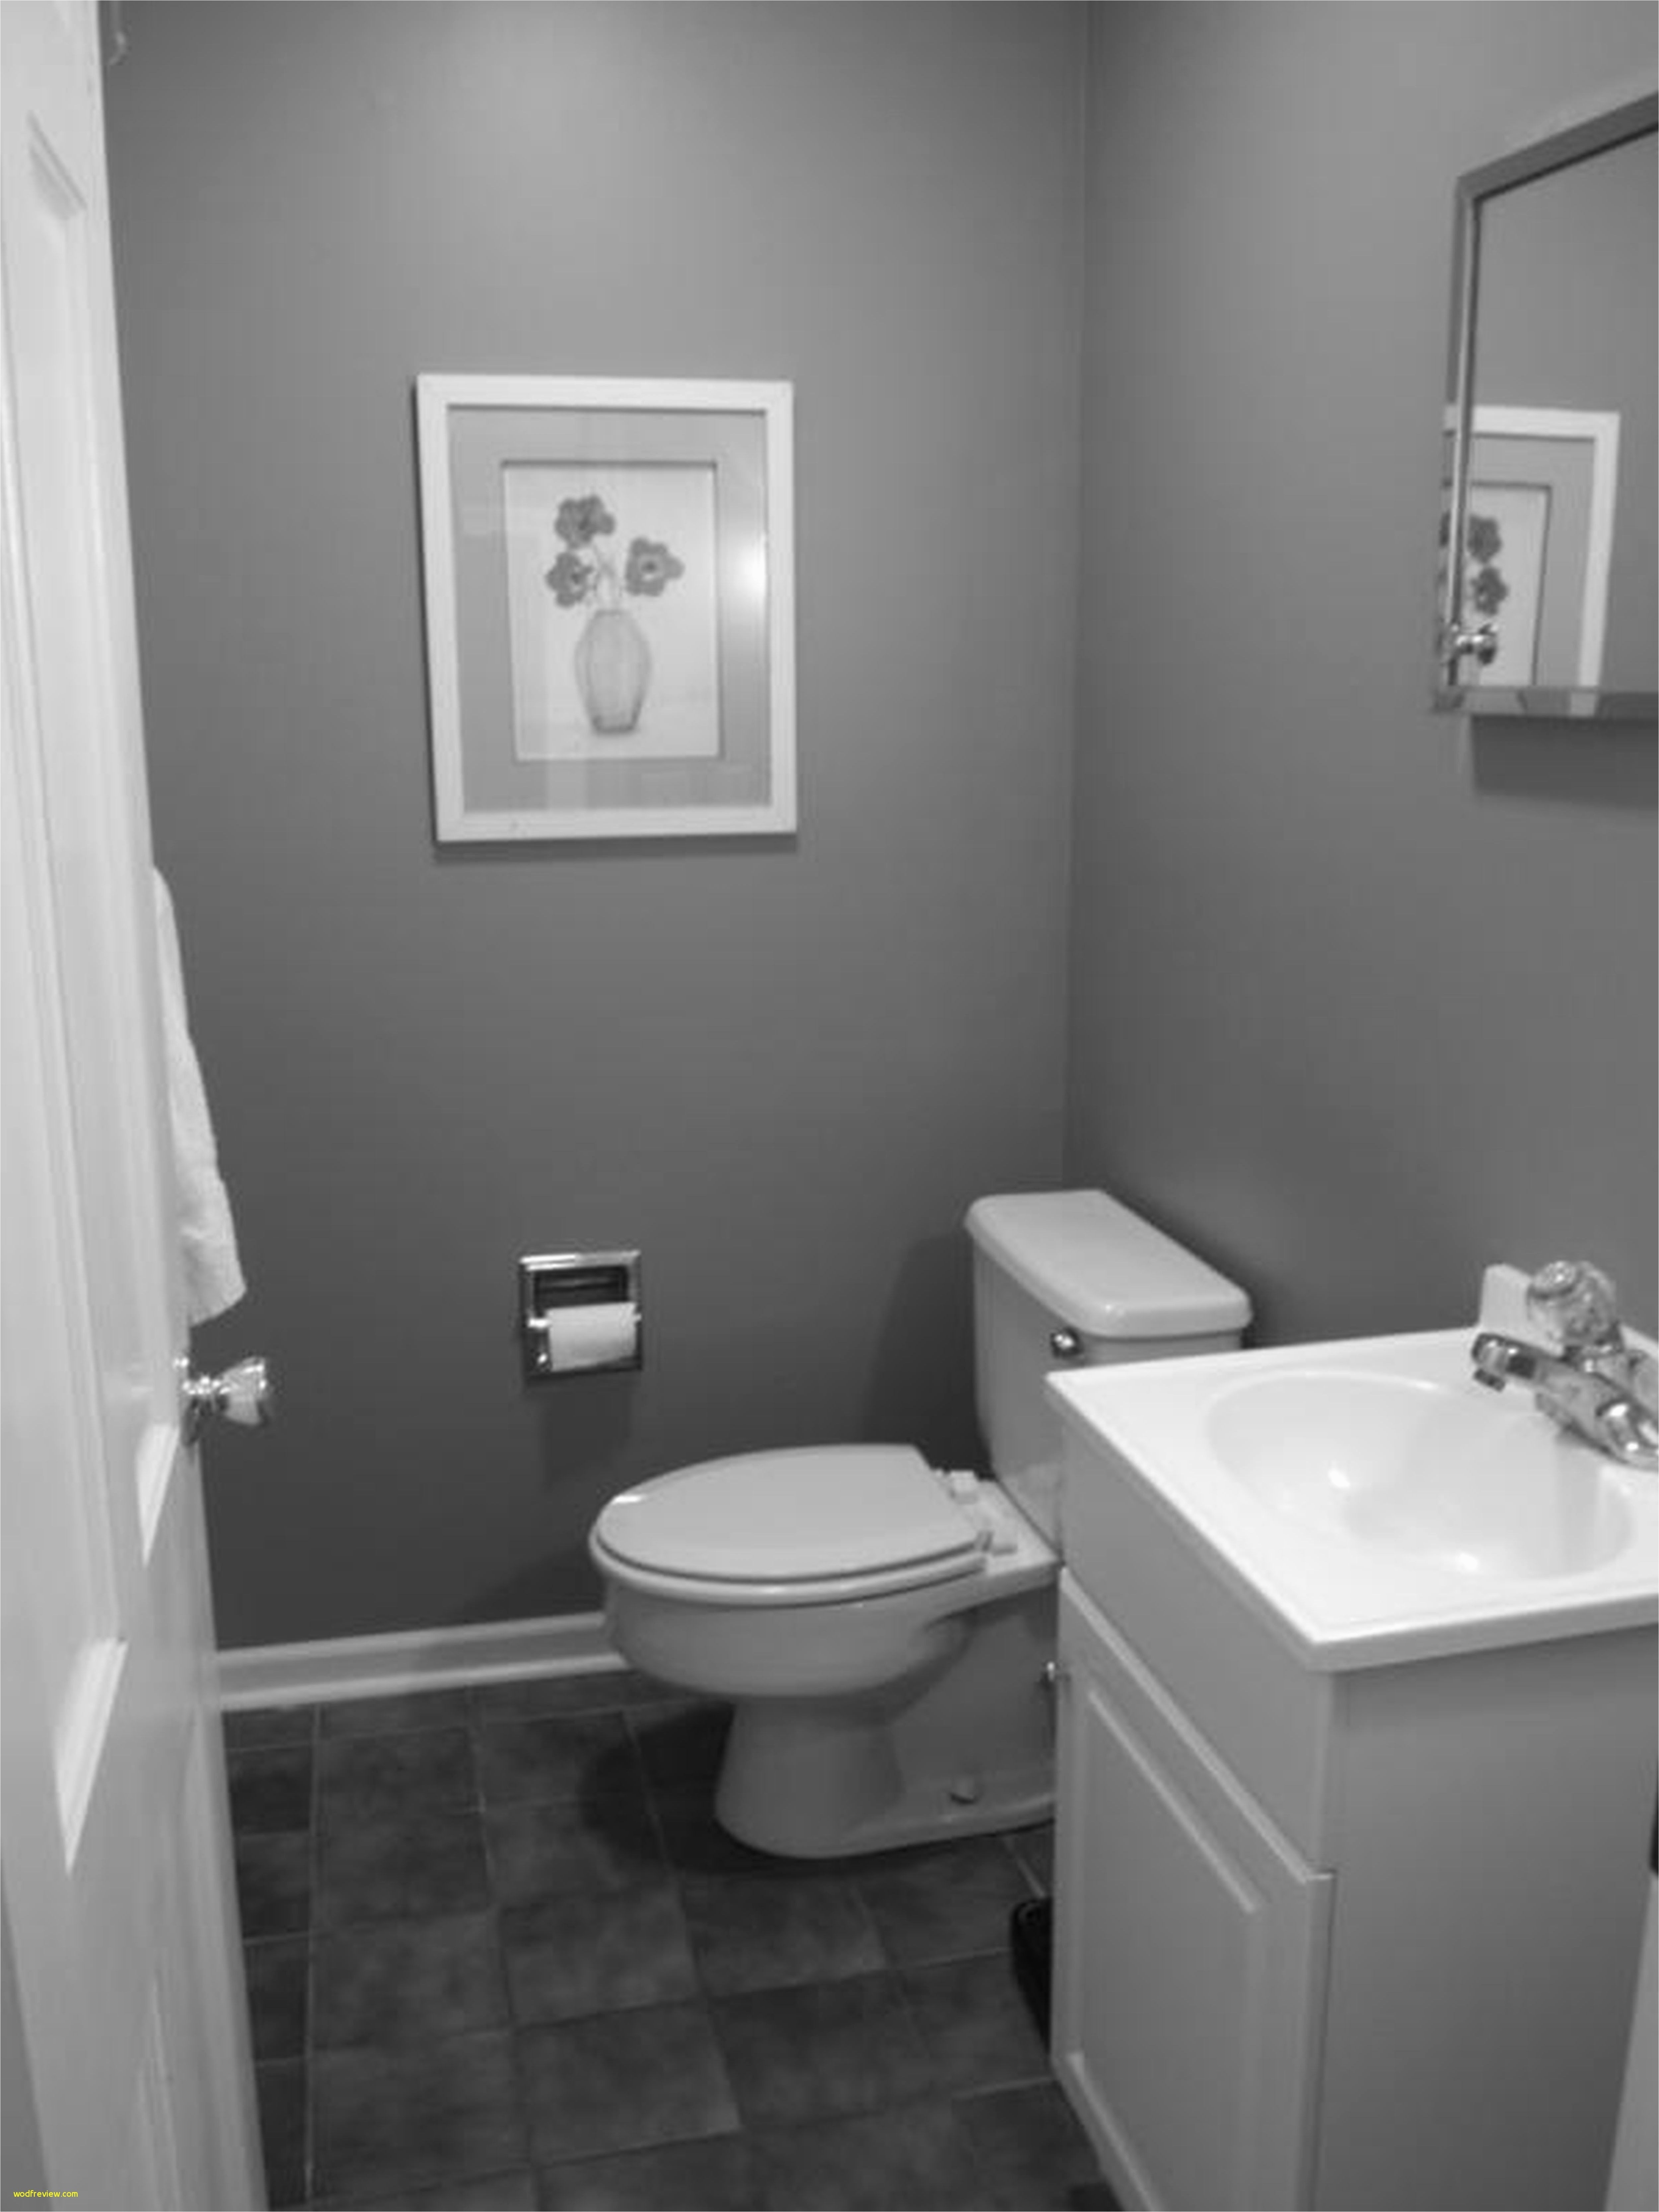 Bathroom Ideas and Design Marvelous Designed Bathroom Best Outdoor Bathroom Ideas Best Grey